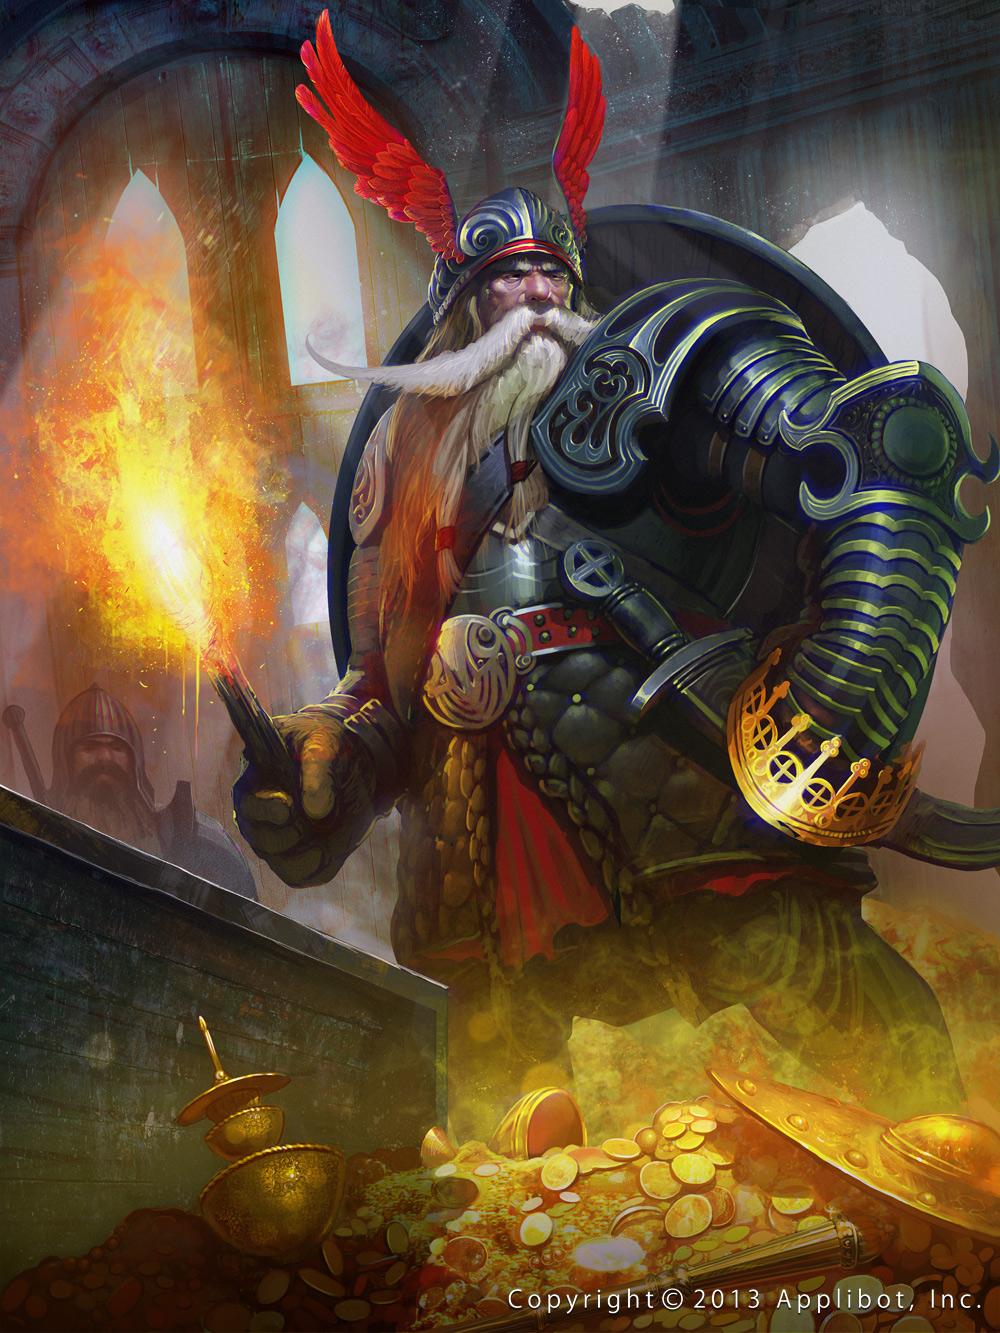 Dwarf King-Of-Souls reg by Cynic-pavel